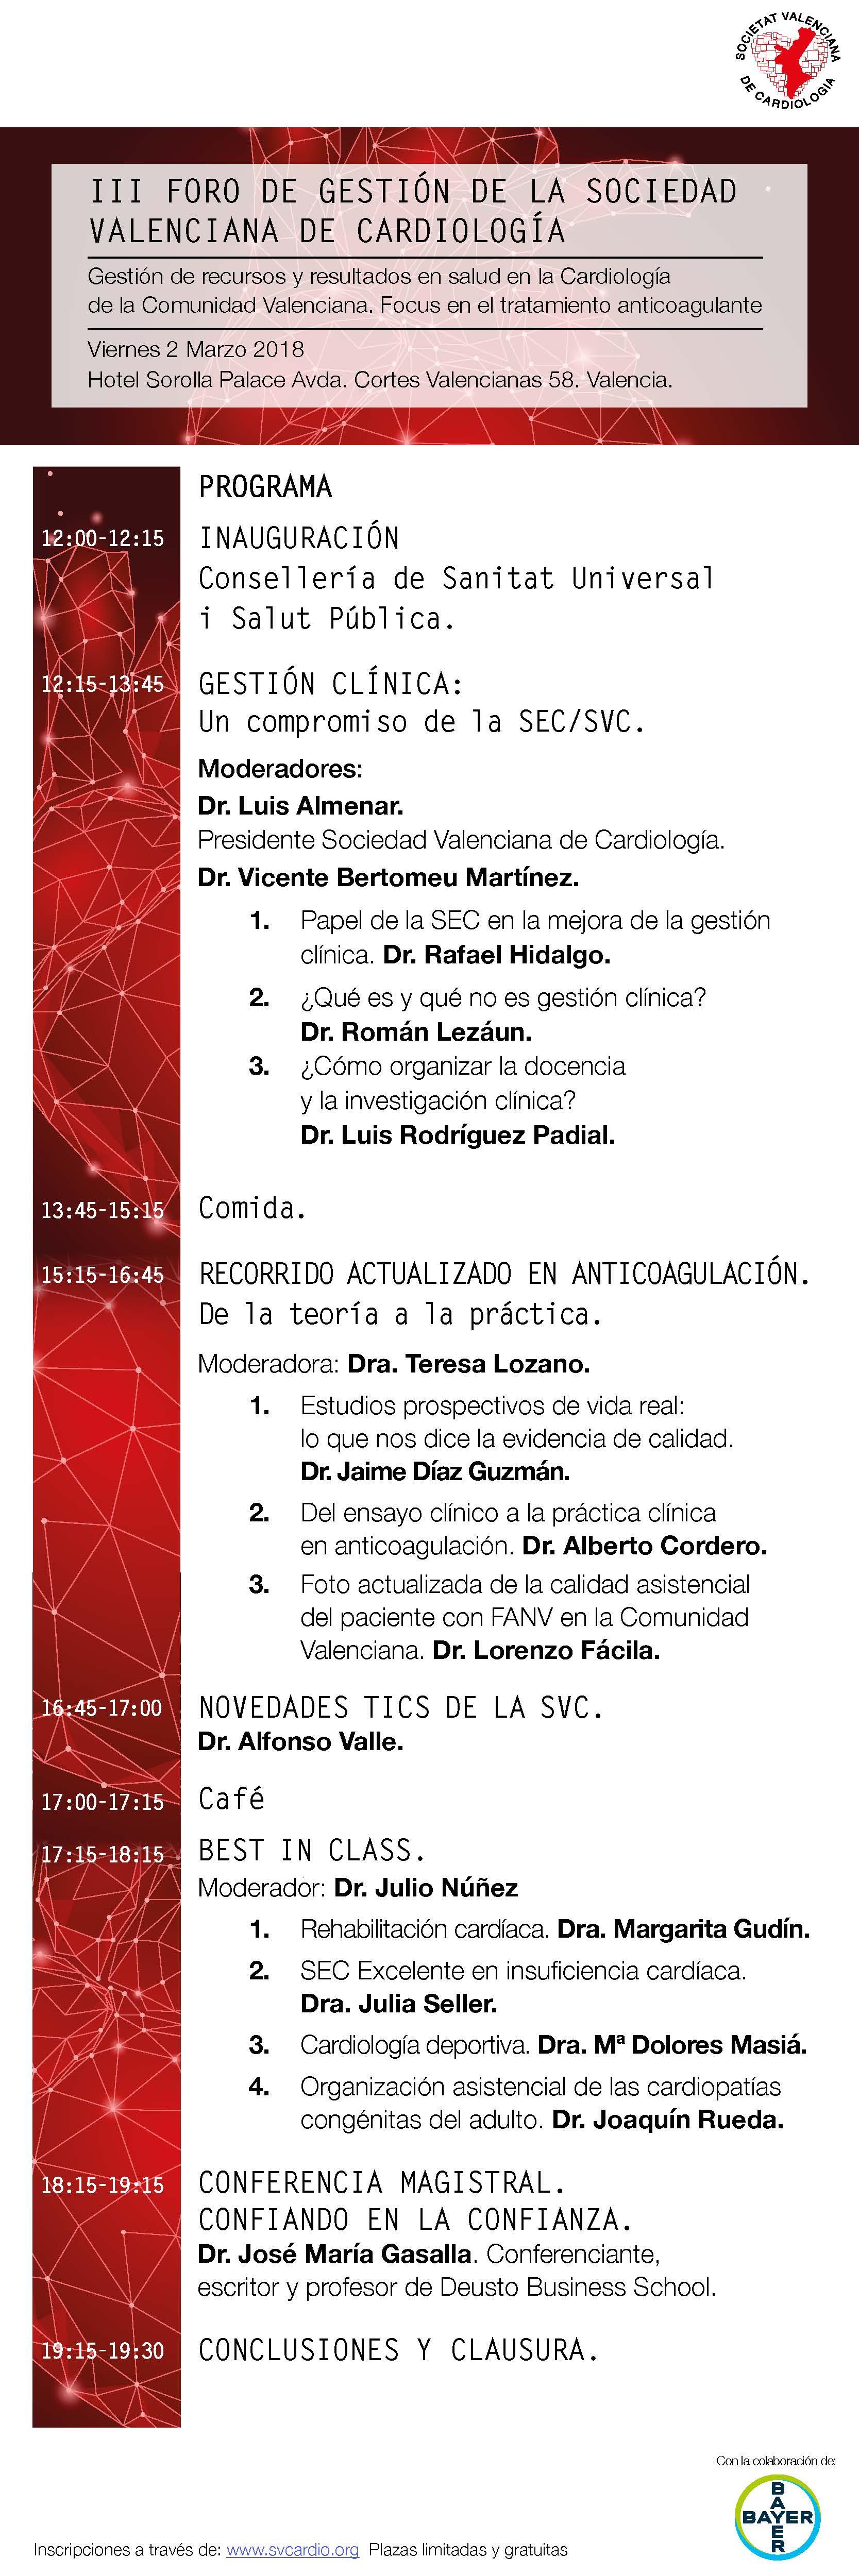 programa-iii-foro-gestion-sociedad-valenciana-cardiologia